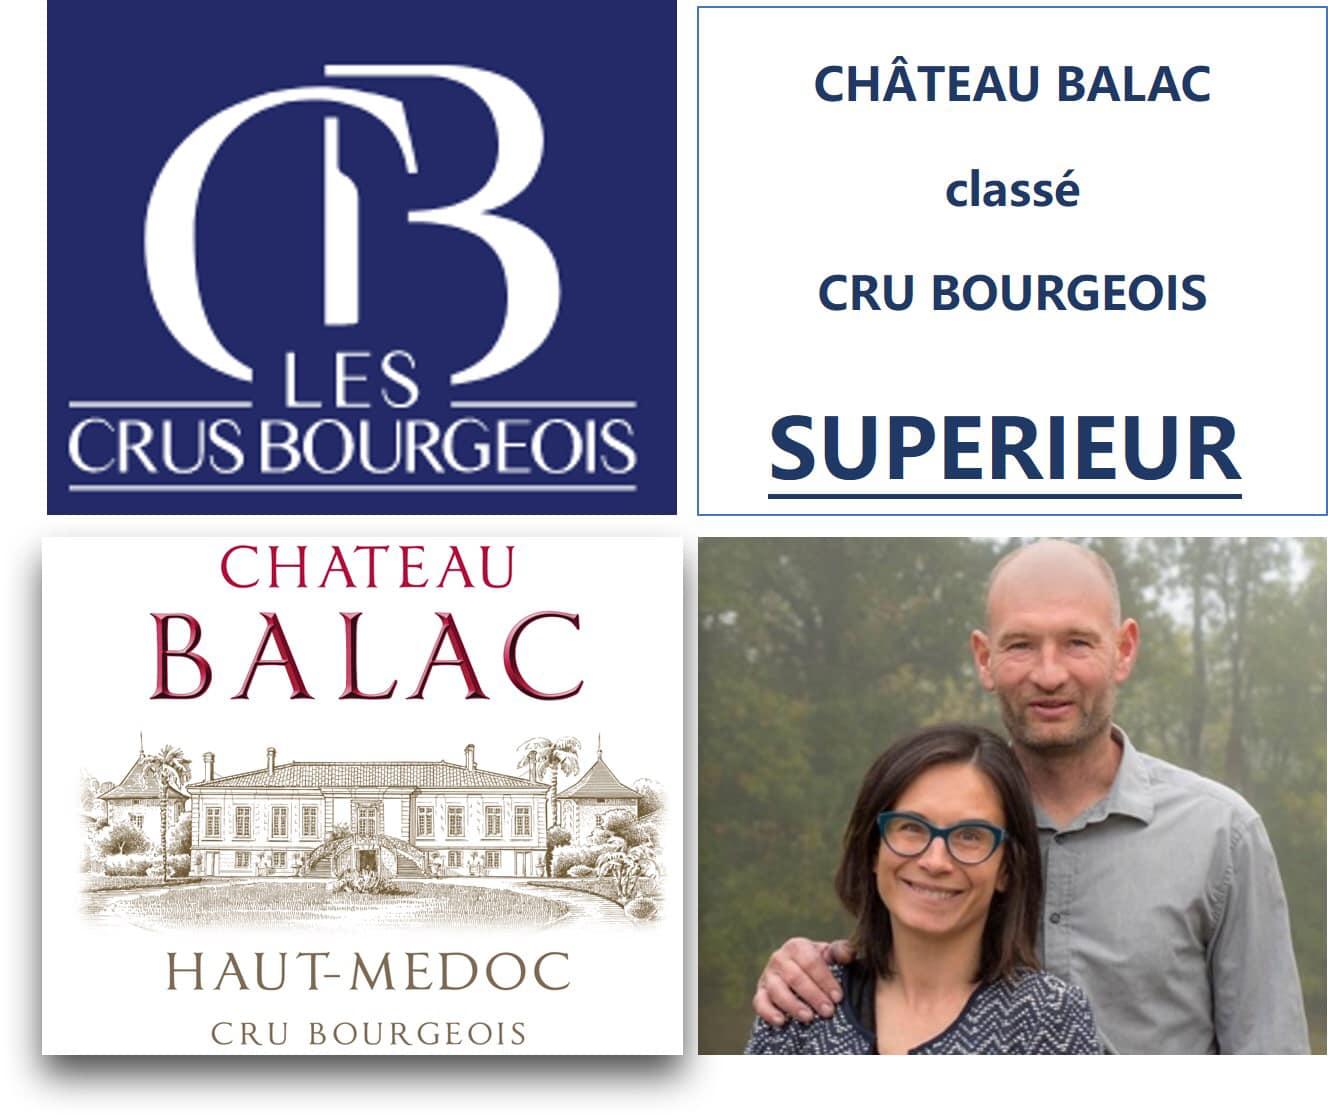 CRU BOURGEOIS SUPERIEUR